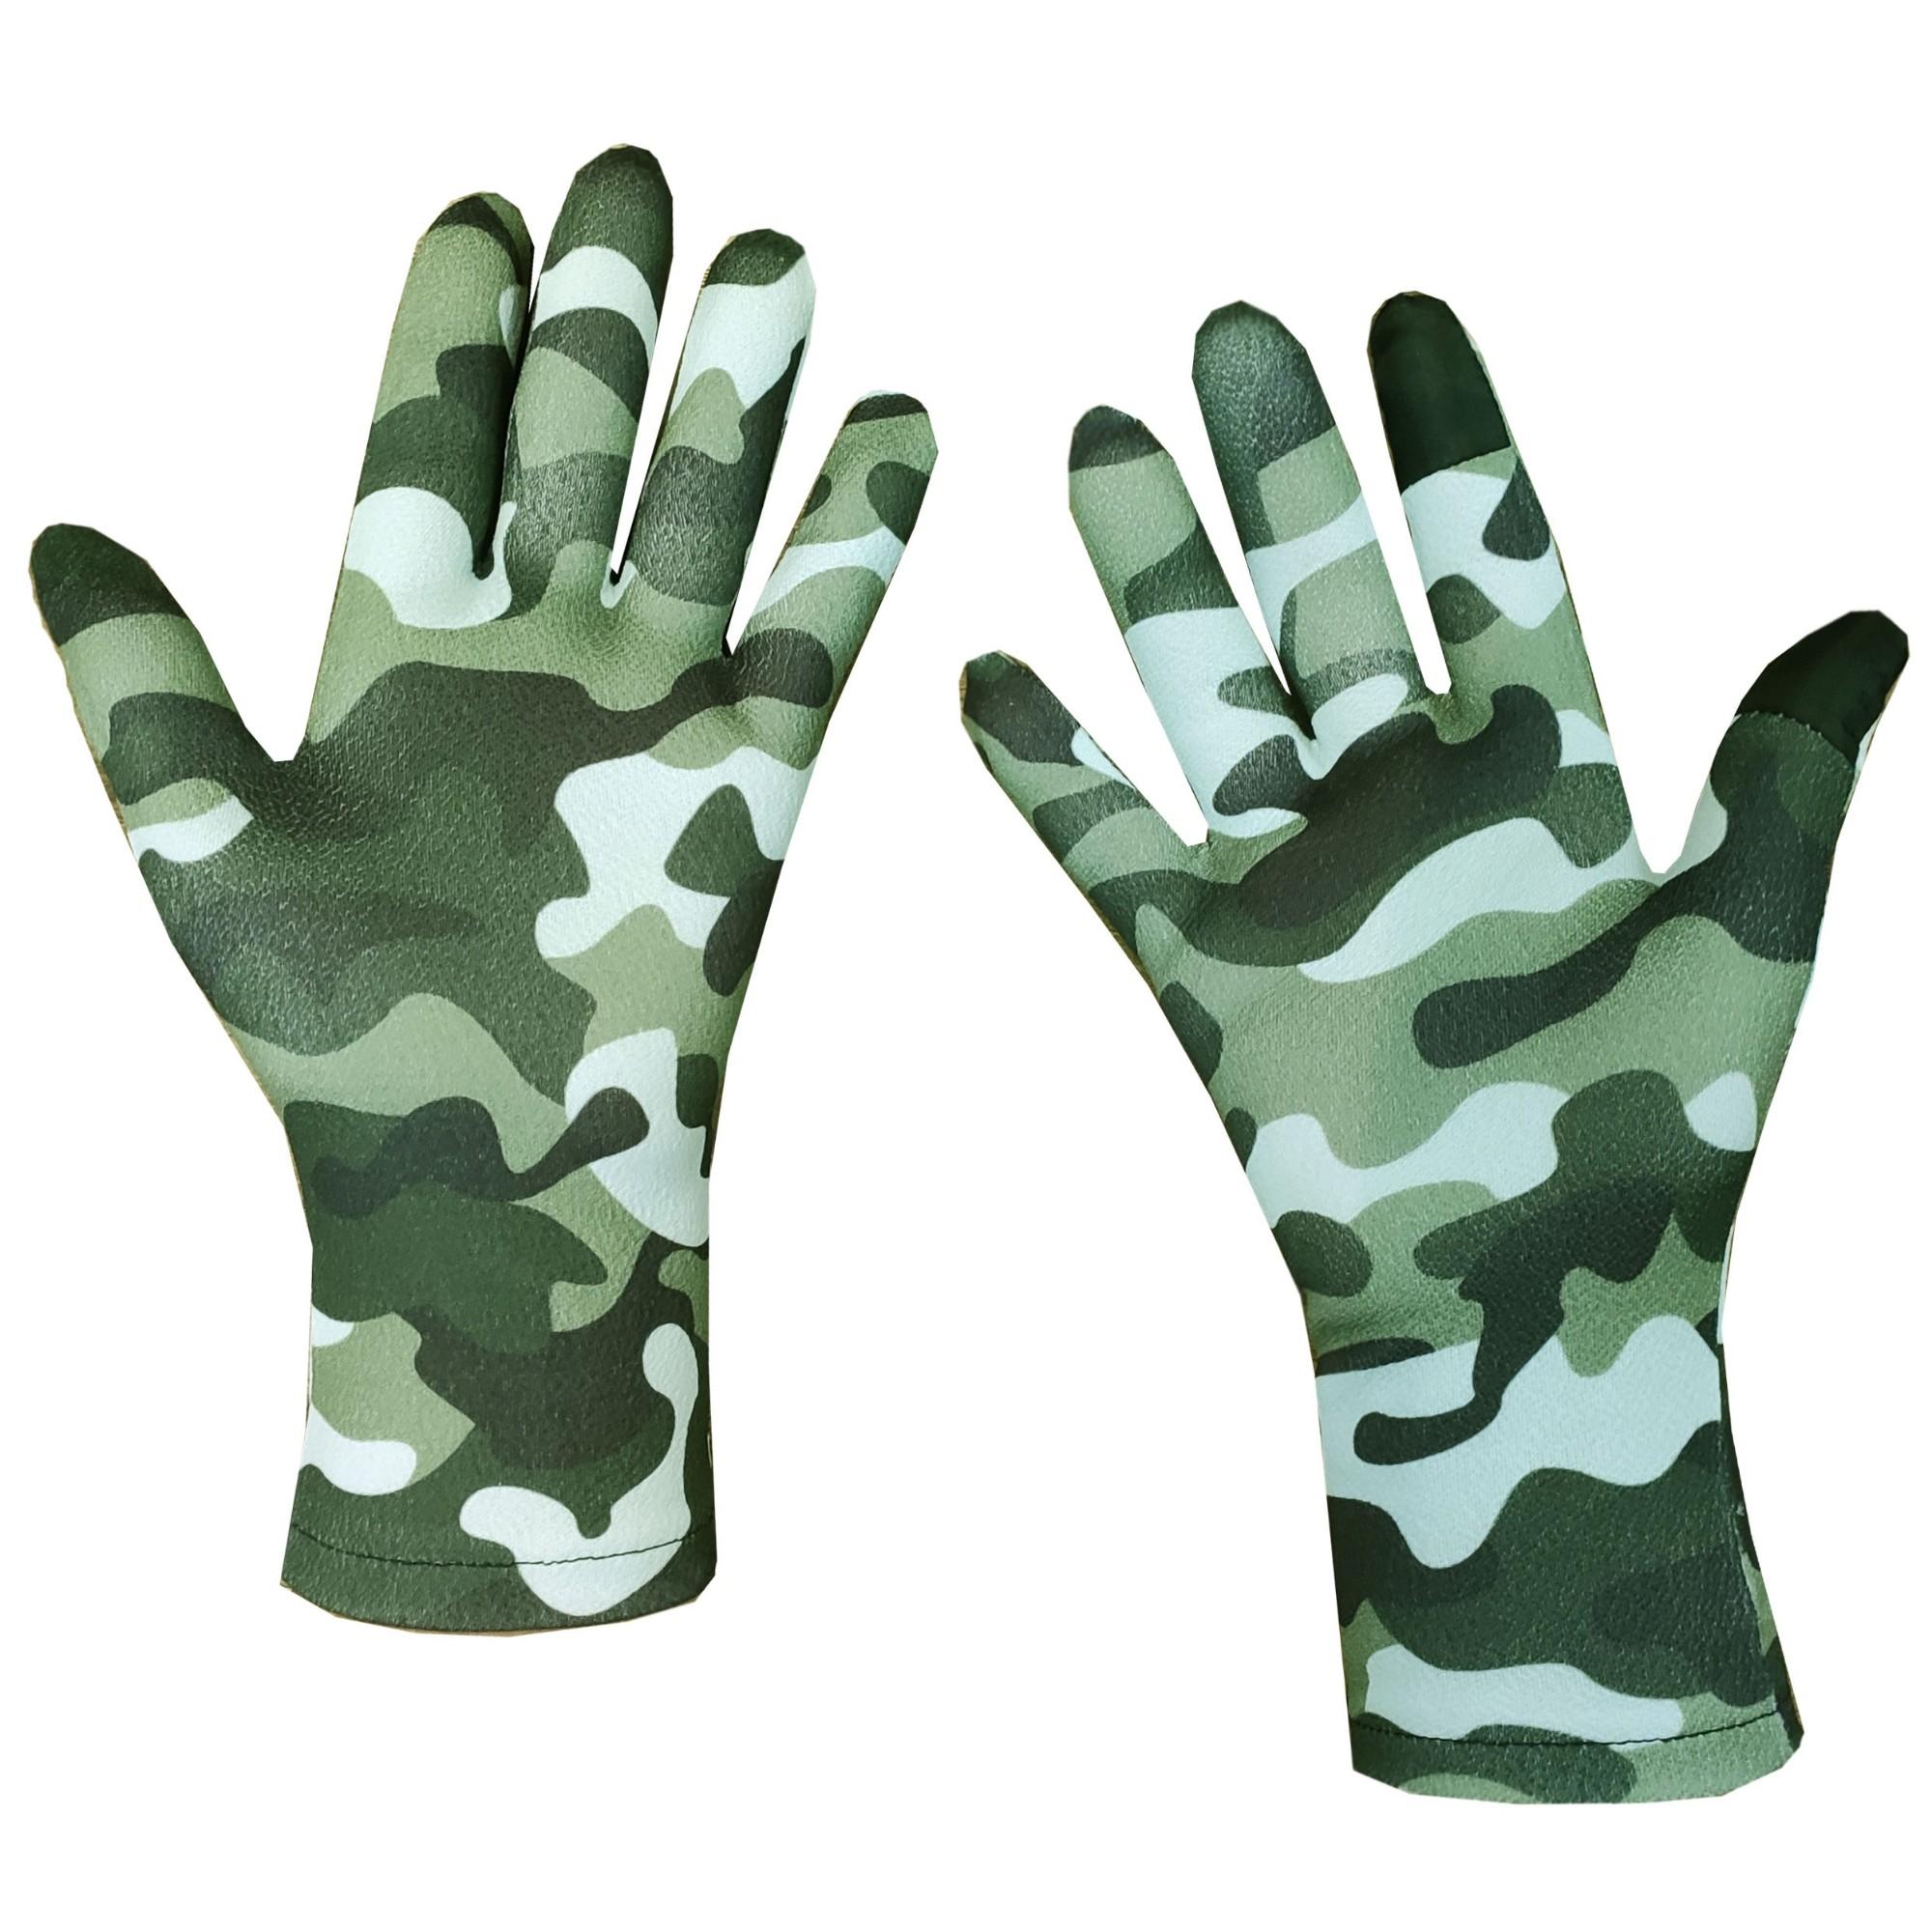 دستکش مردانه تادو طرح چریکی کد 314